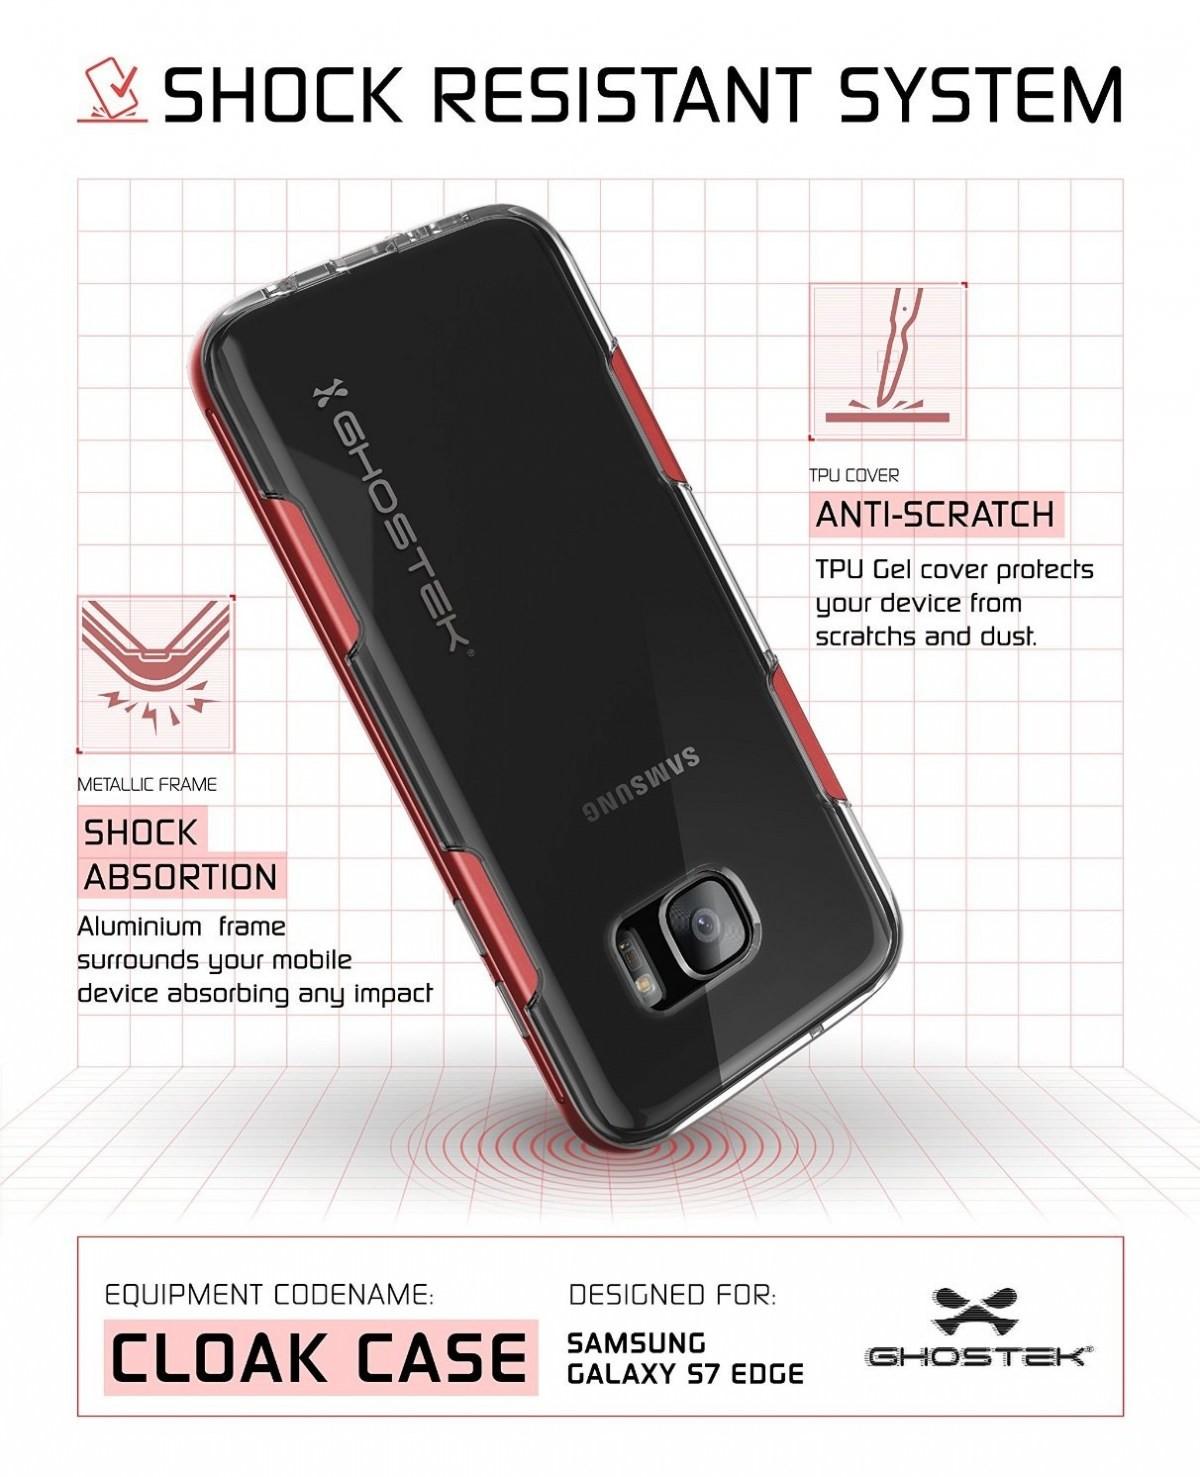 Ranking Etui I Futeraw Do Telefonu Samsung Galaxy S7 Edge Pro Rearth Iphone 4s Ringke Kiwi Ghostek Cloak Szko Red